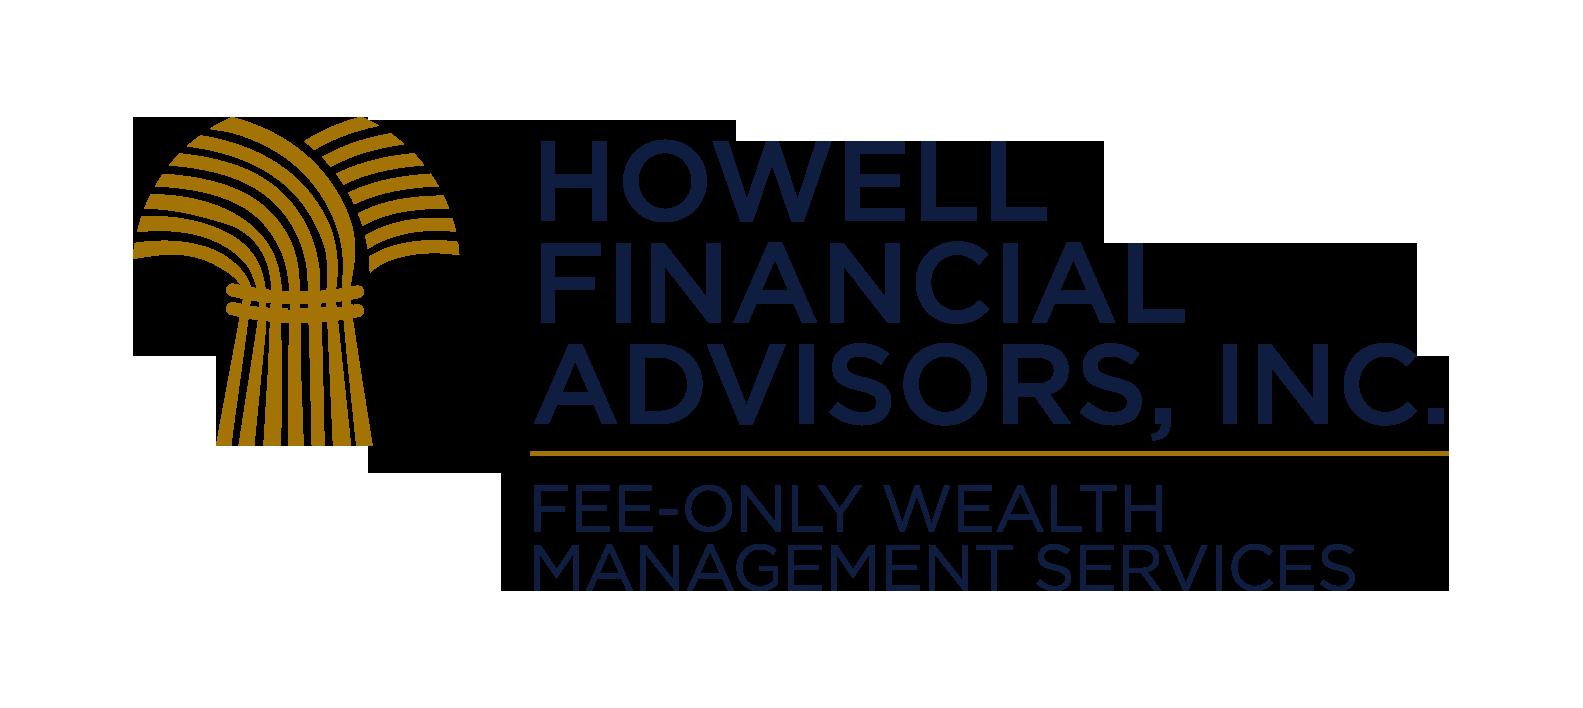 Howell Financial Advisors, Inc.